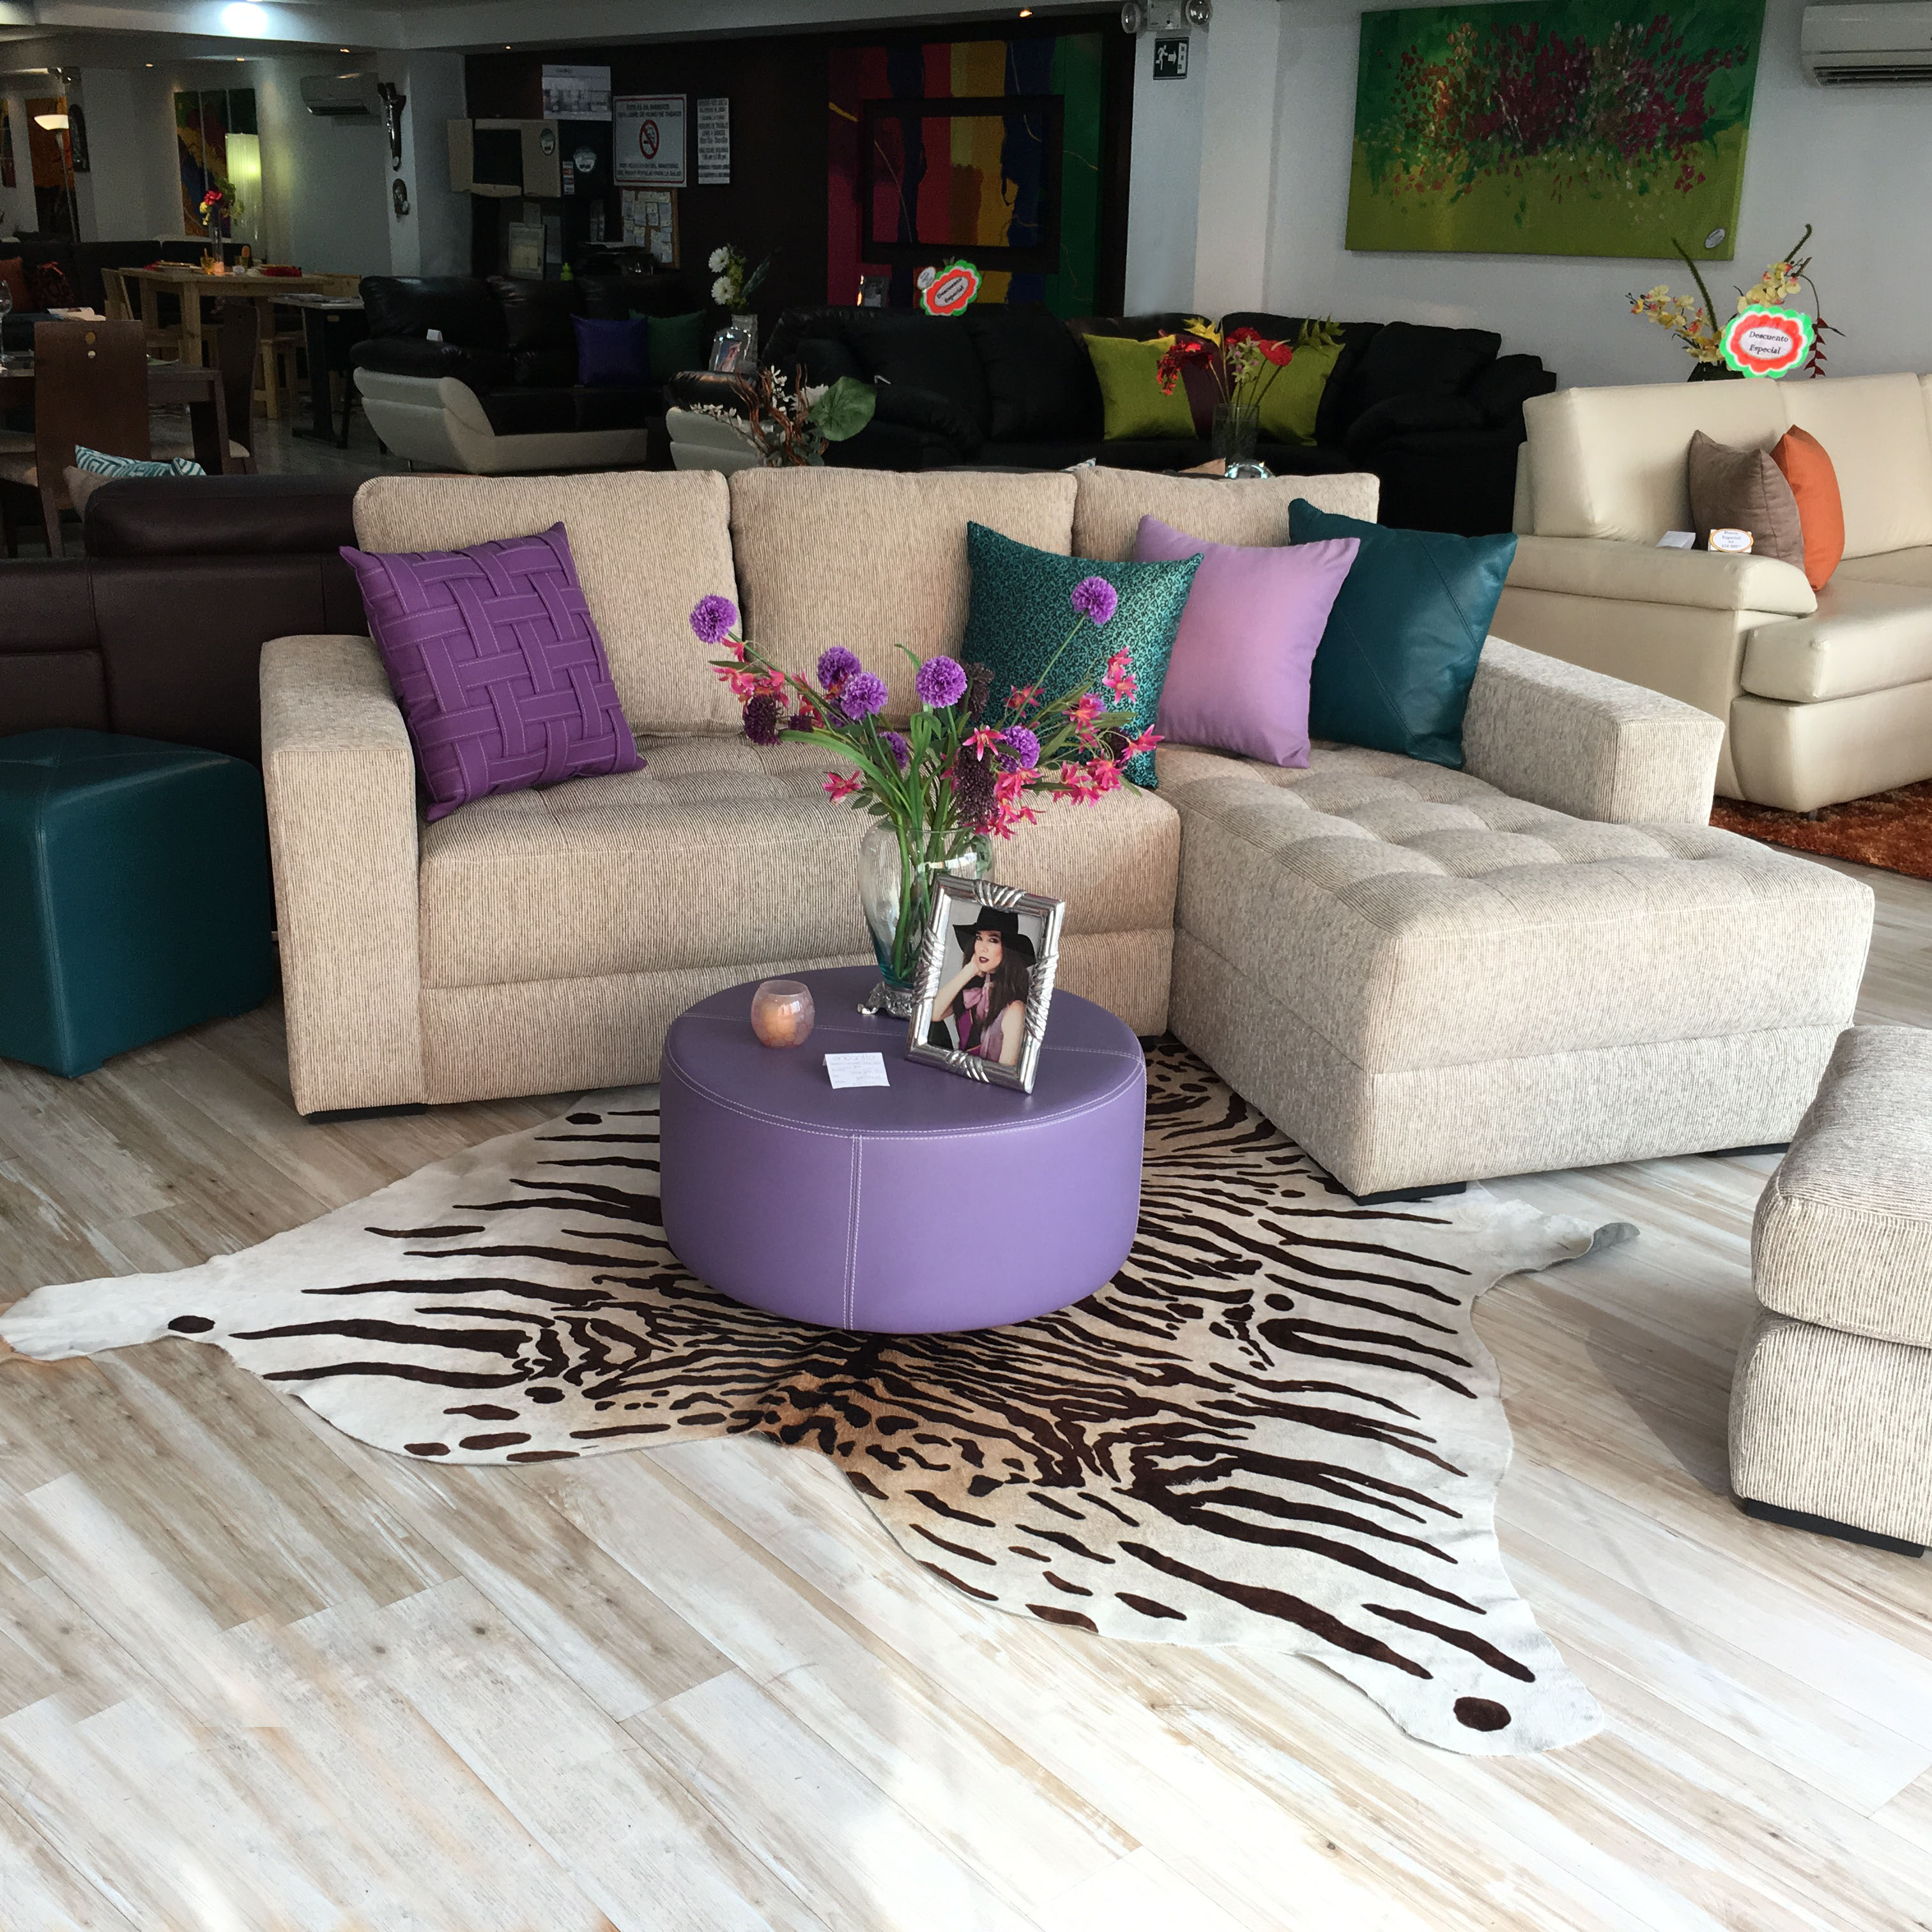 Encantto Furniture Stores  # Muebles Modulares Bipiel